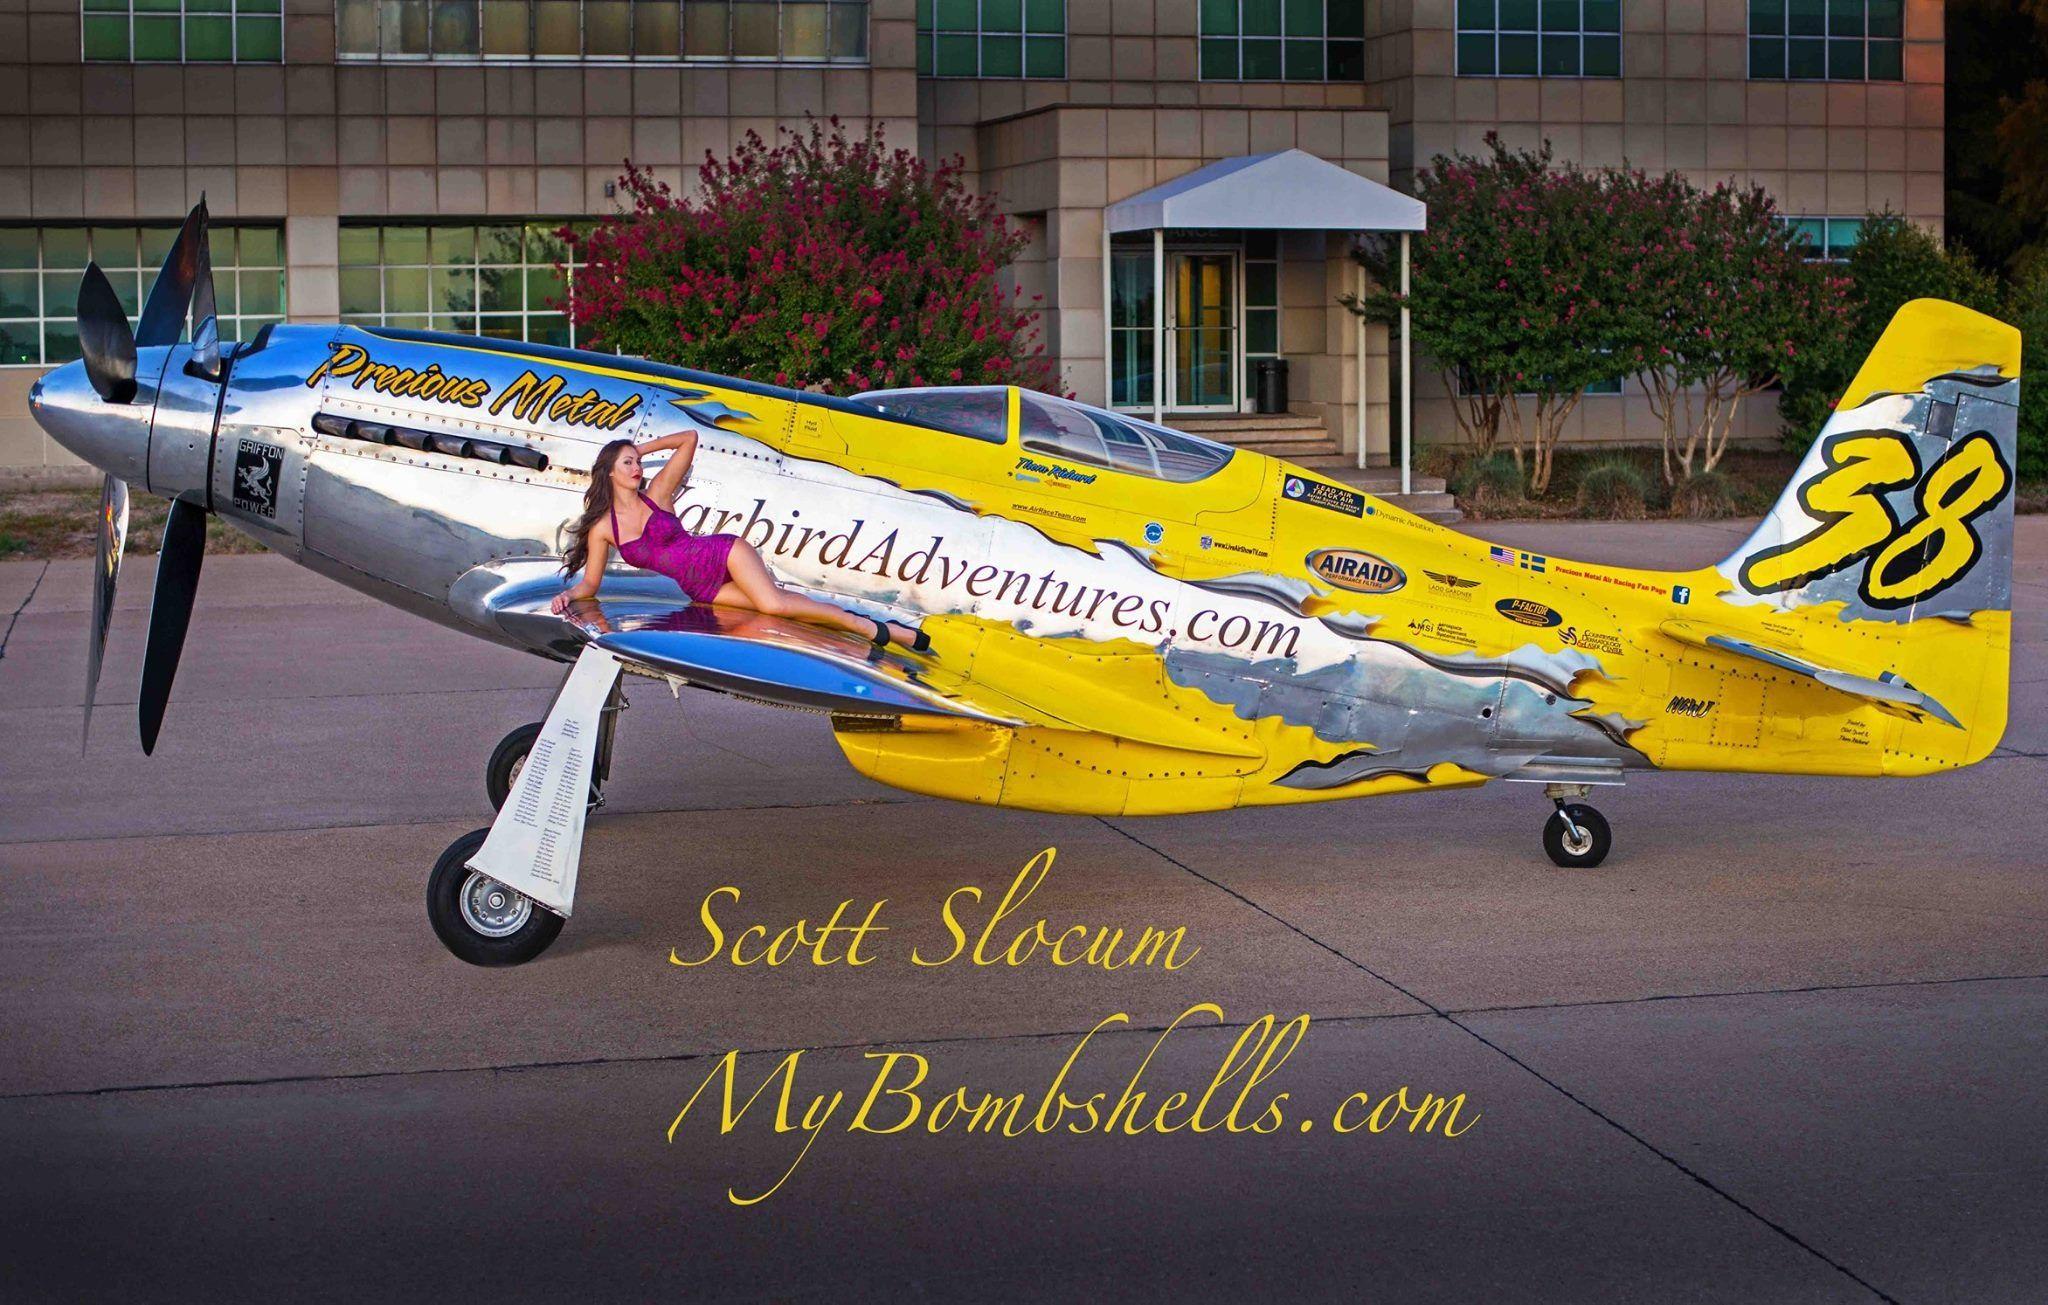 Precious Metal Reno air races, Air race